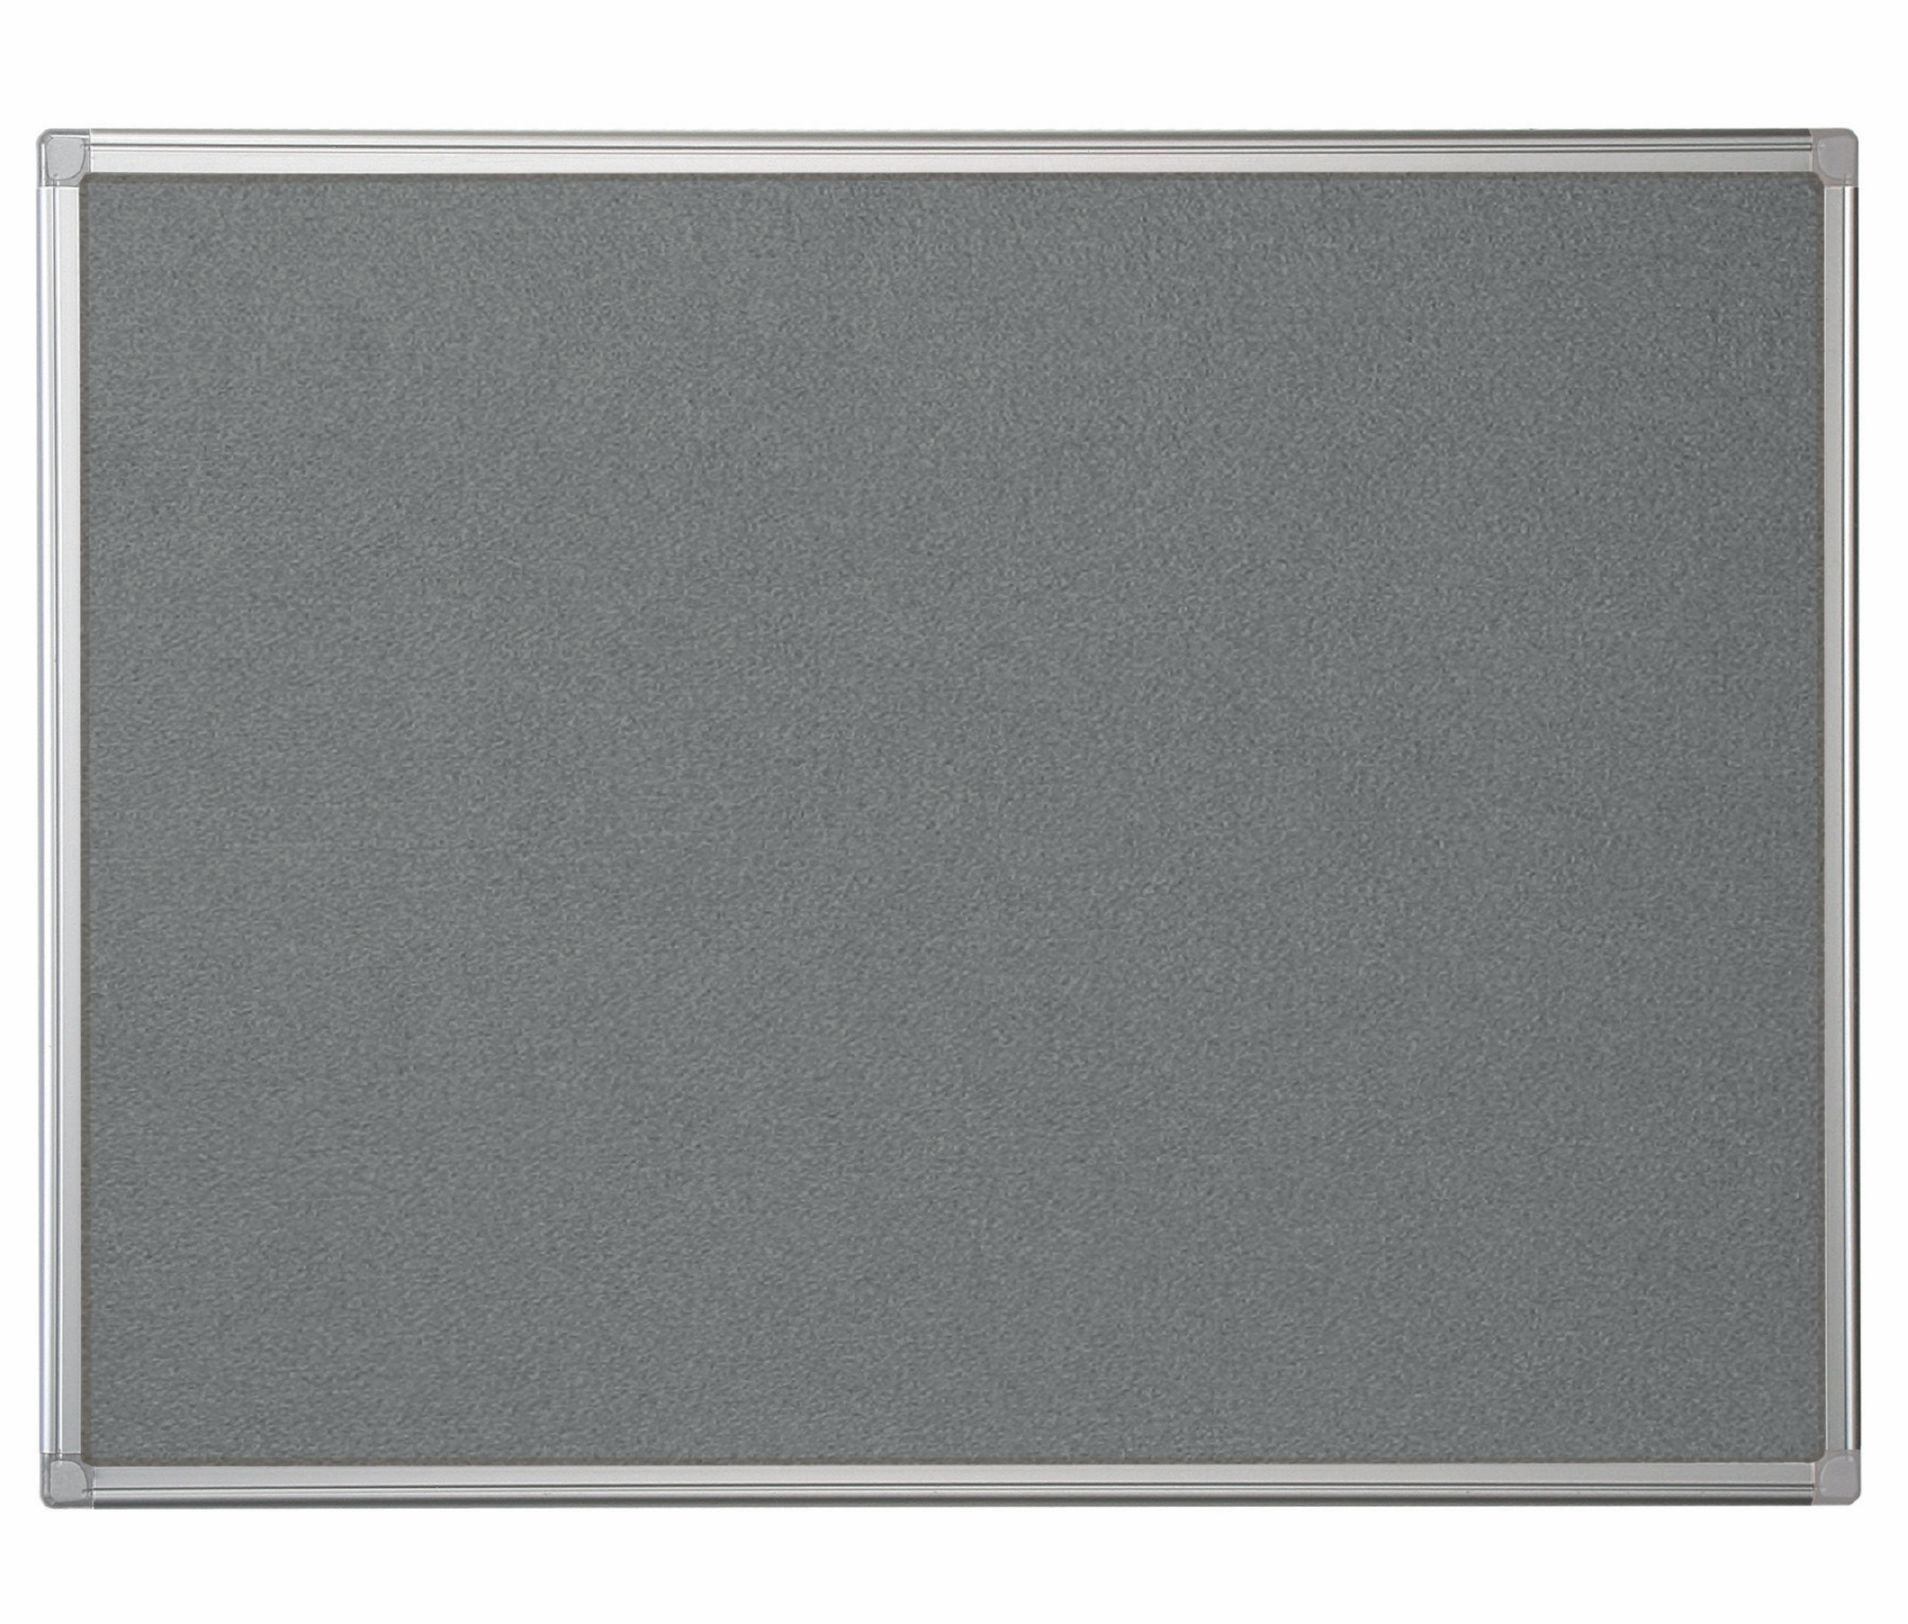 Felt Bi-Office Maya Grey Felt Noticeboard Aluminium Frame 1200x1200mm